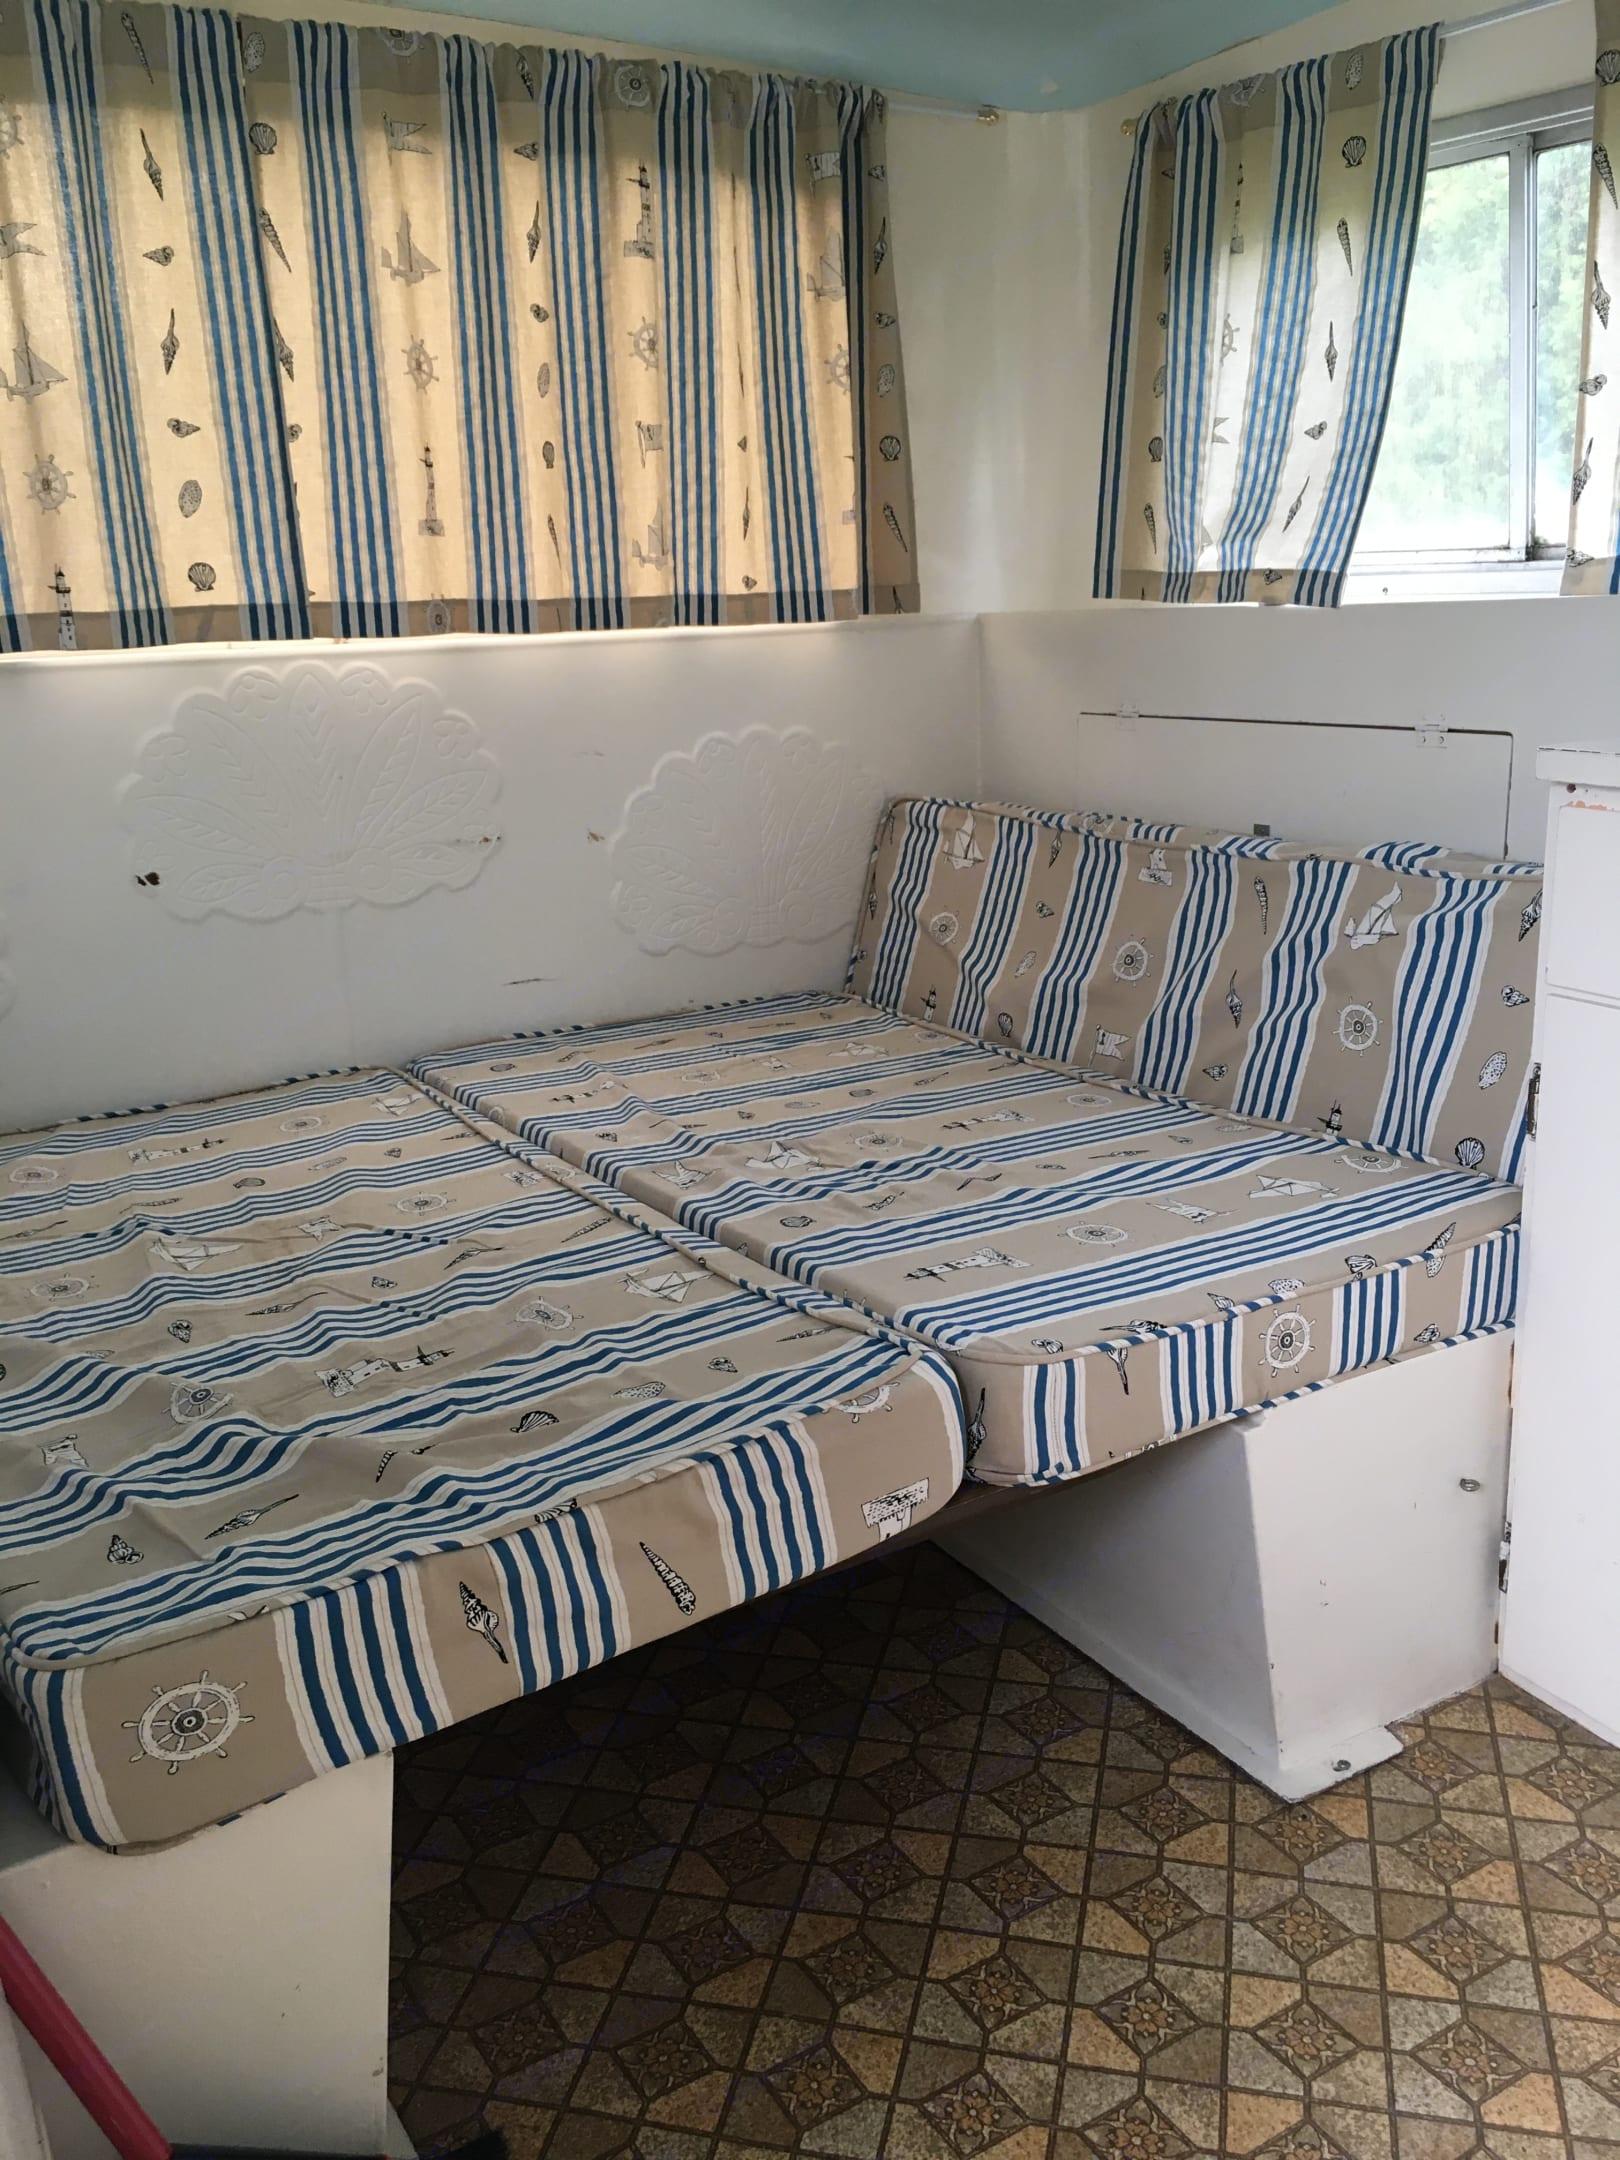 Dbl bed comes with egg foam mattress brand new in closet. Boler AerFlo 2140 1972